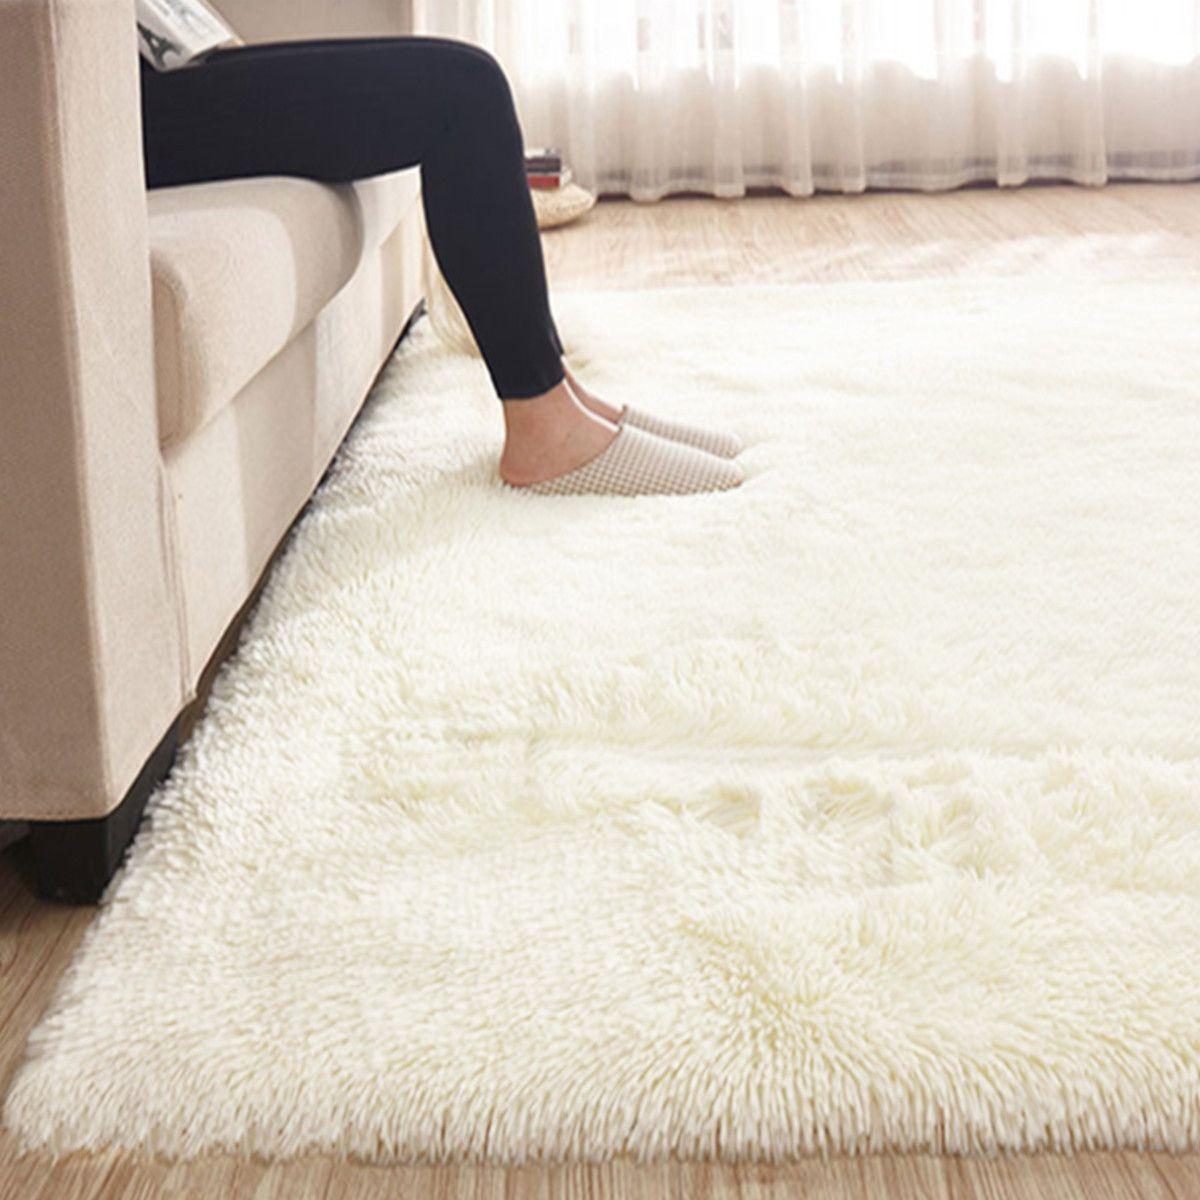 Insma Modern Soft Fluffy Floor Rug Anti Skid Shag Shaggy Area Rug Home Bedroom Living Room Carpet Child Play Mat Yoga Mat Walmart Com In 2020 Bedroom Area Rug Bedroom Carpet Rugs